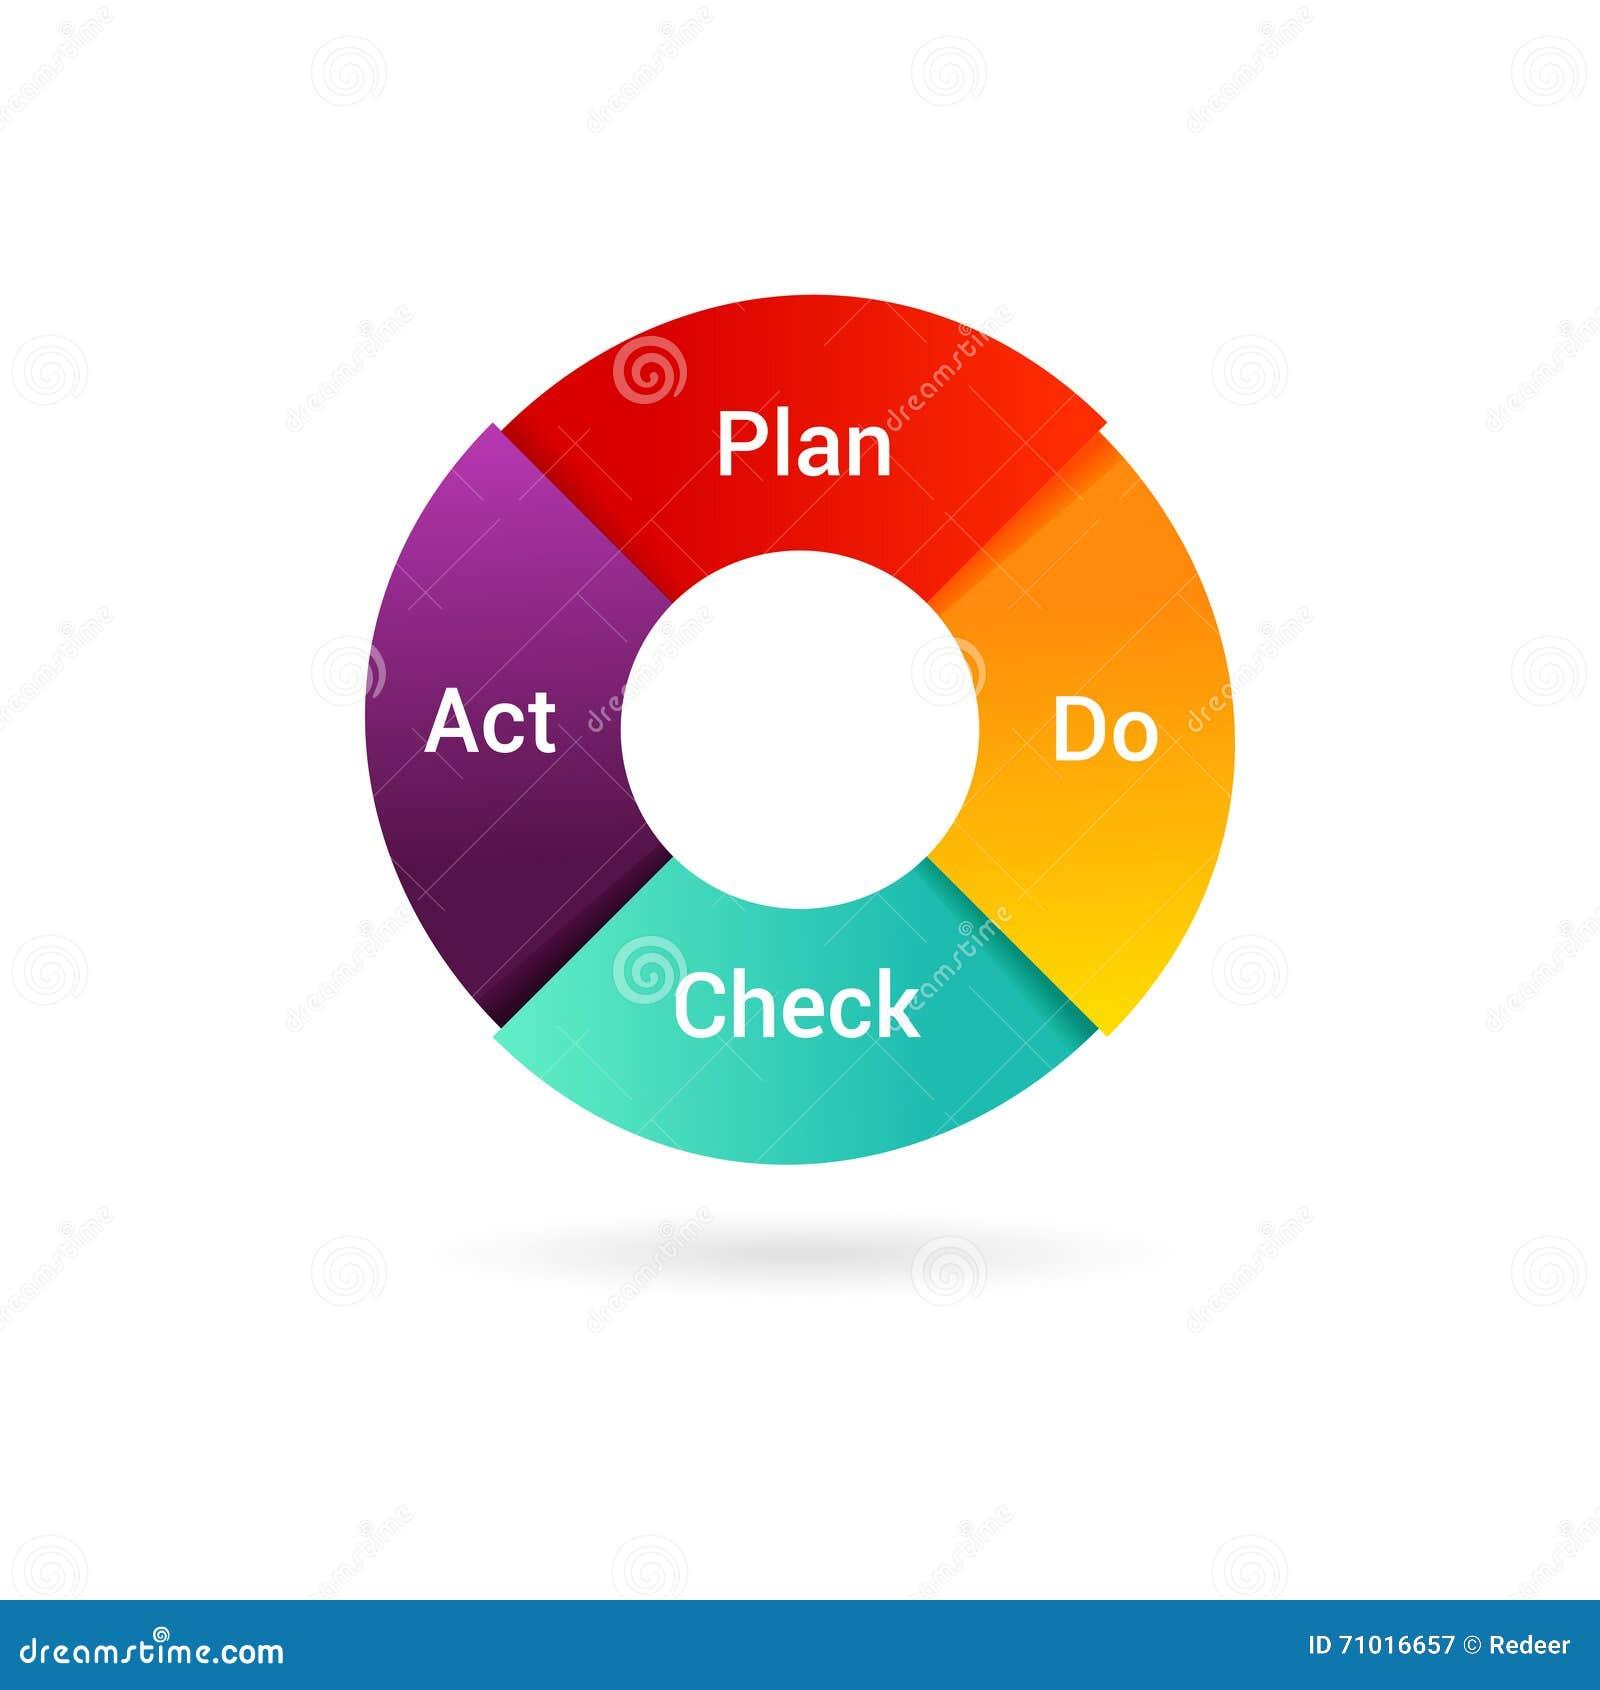 4 Factors that Make a Continuous Improvement Program Successful